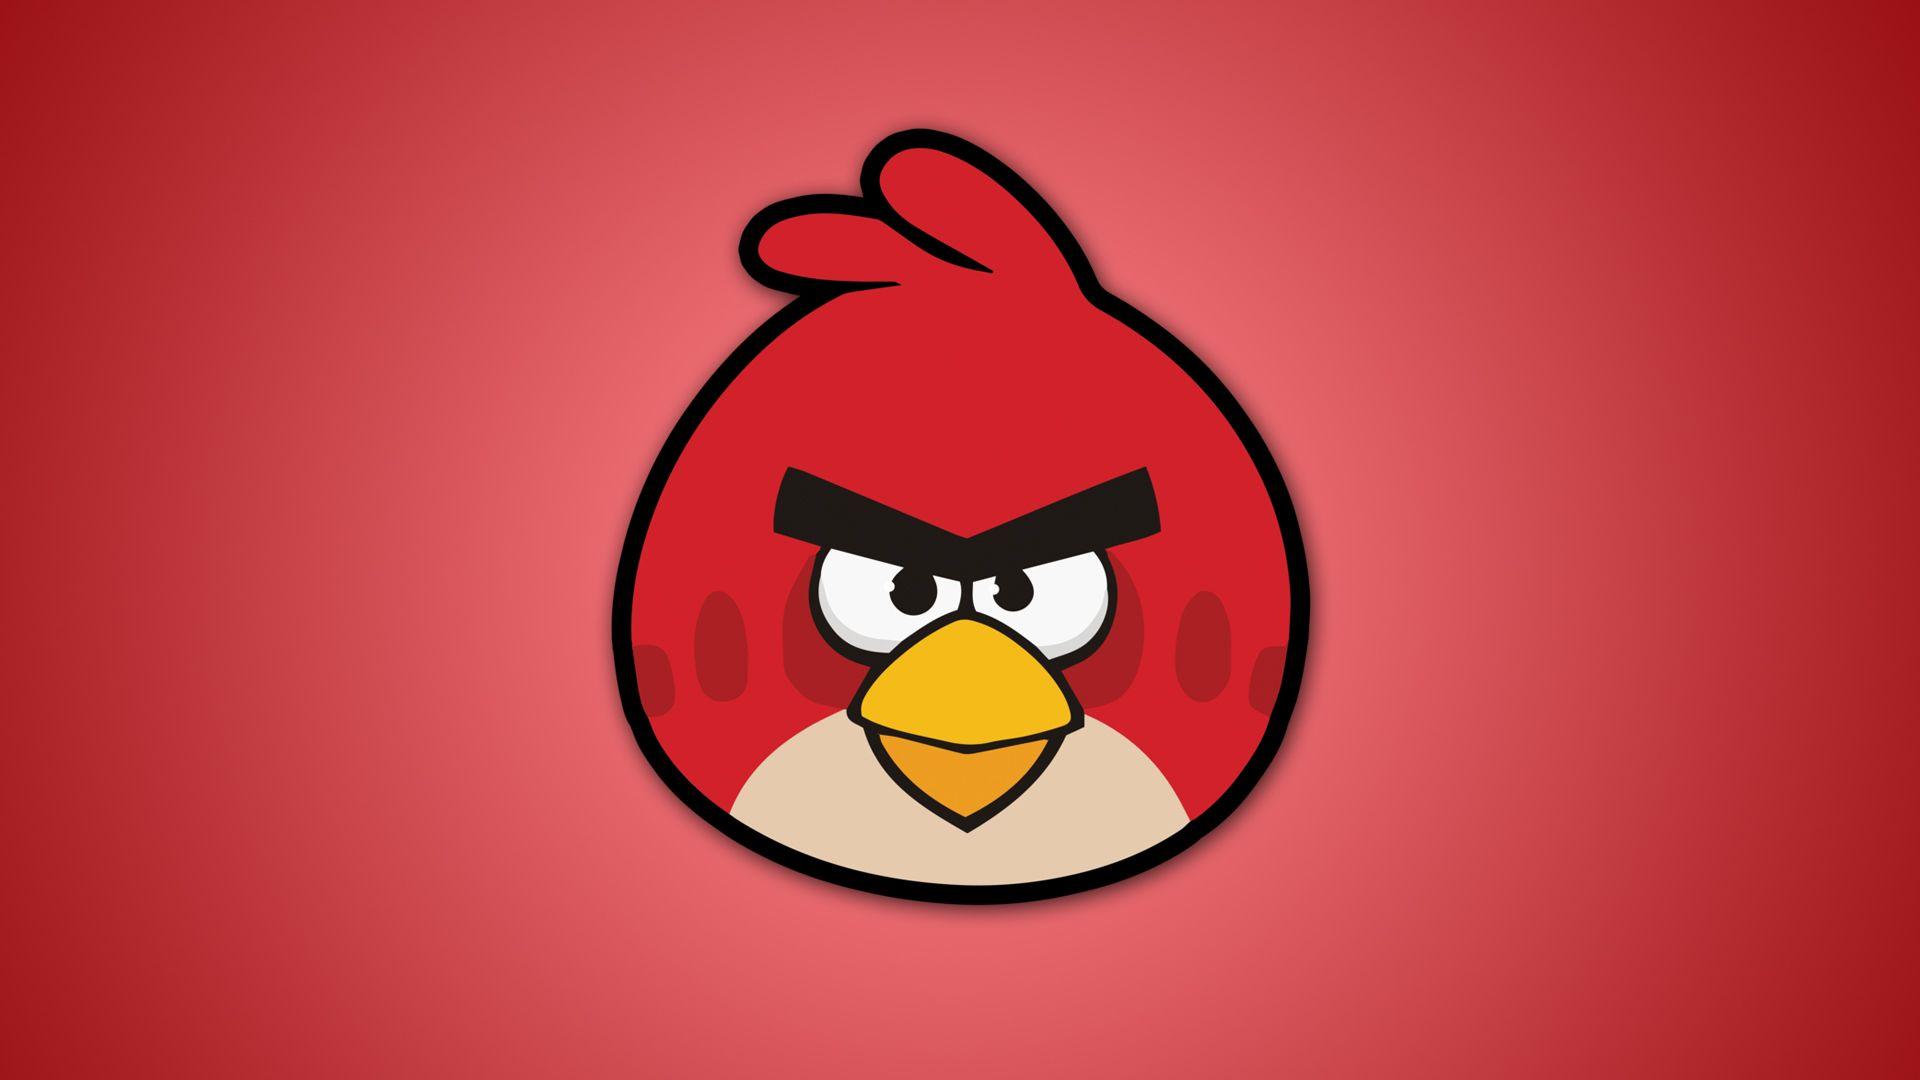 Angry Birds Wallpaper Hd , HD Wallpaper & Backgrounds